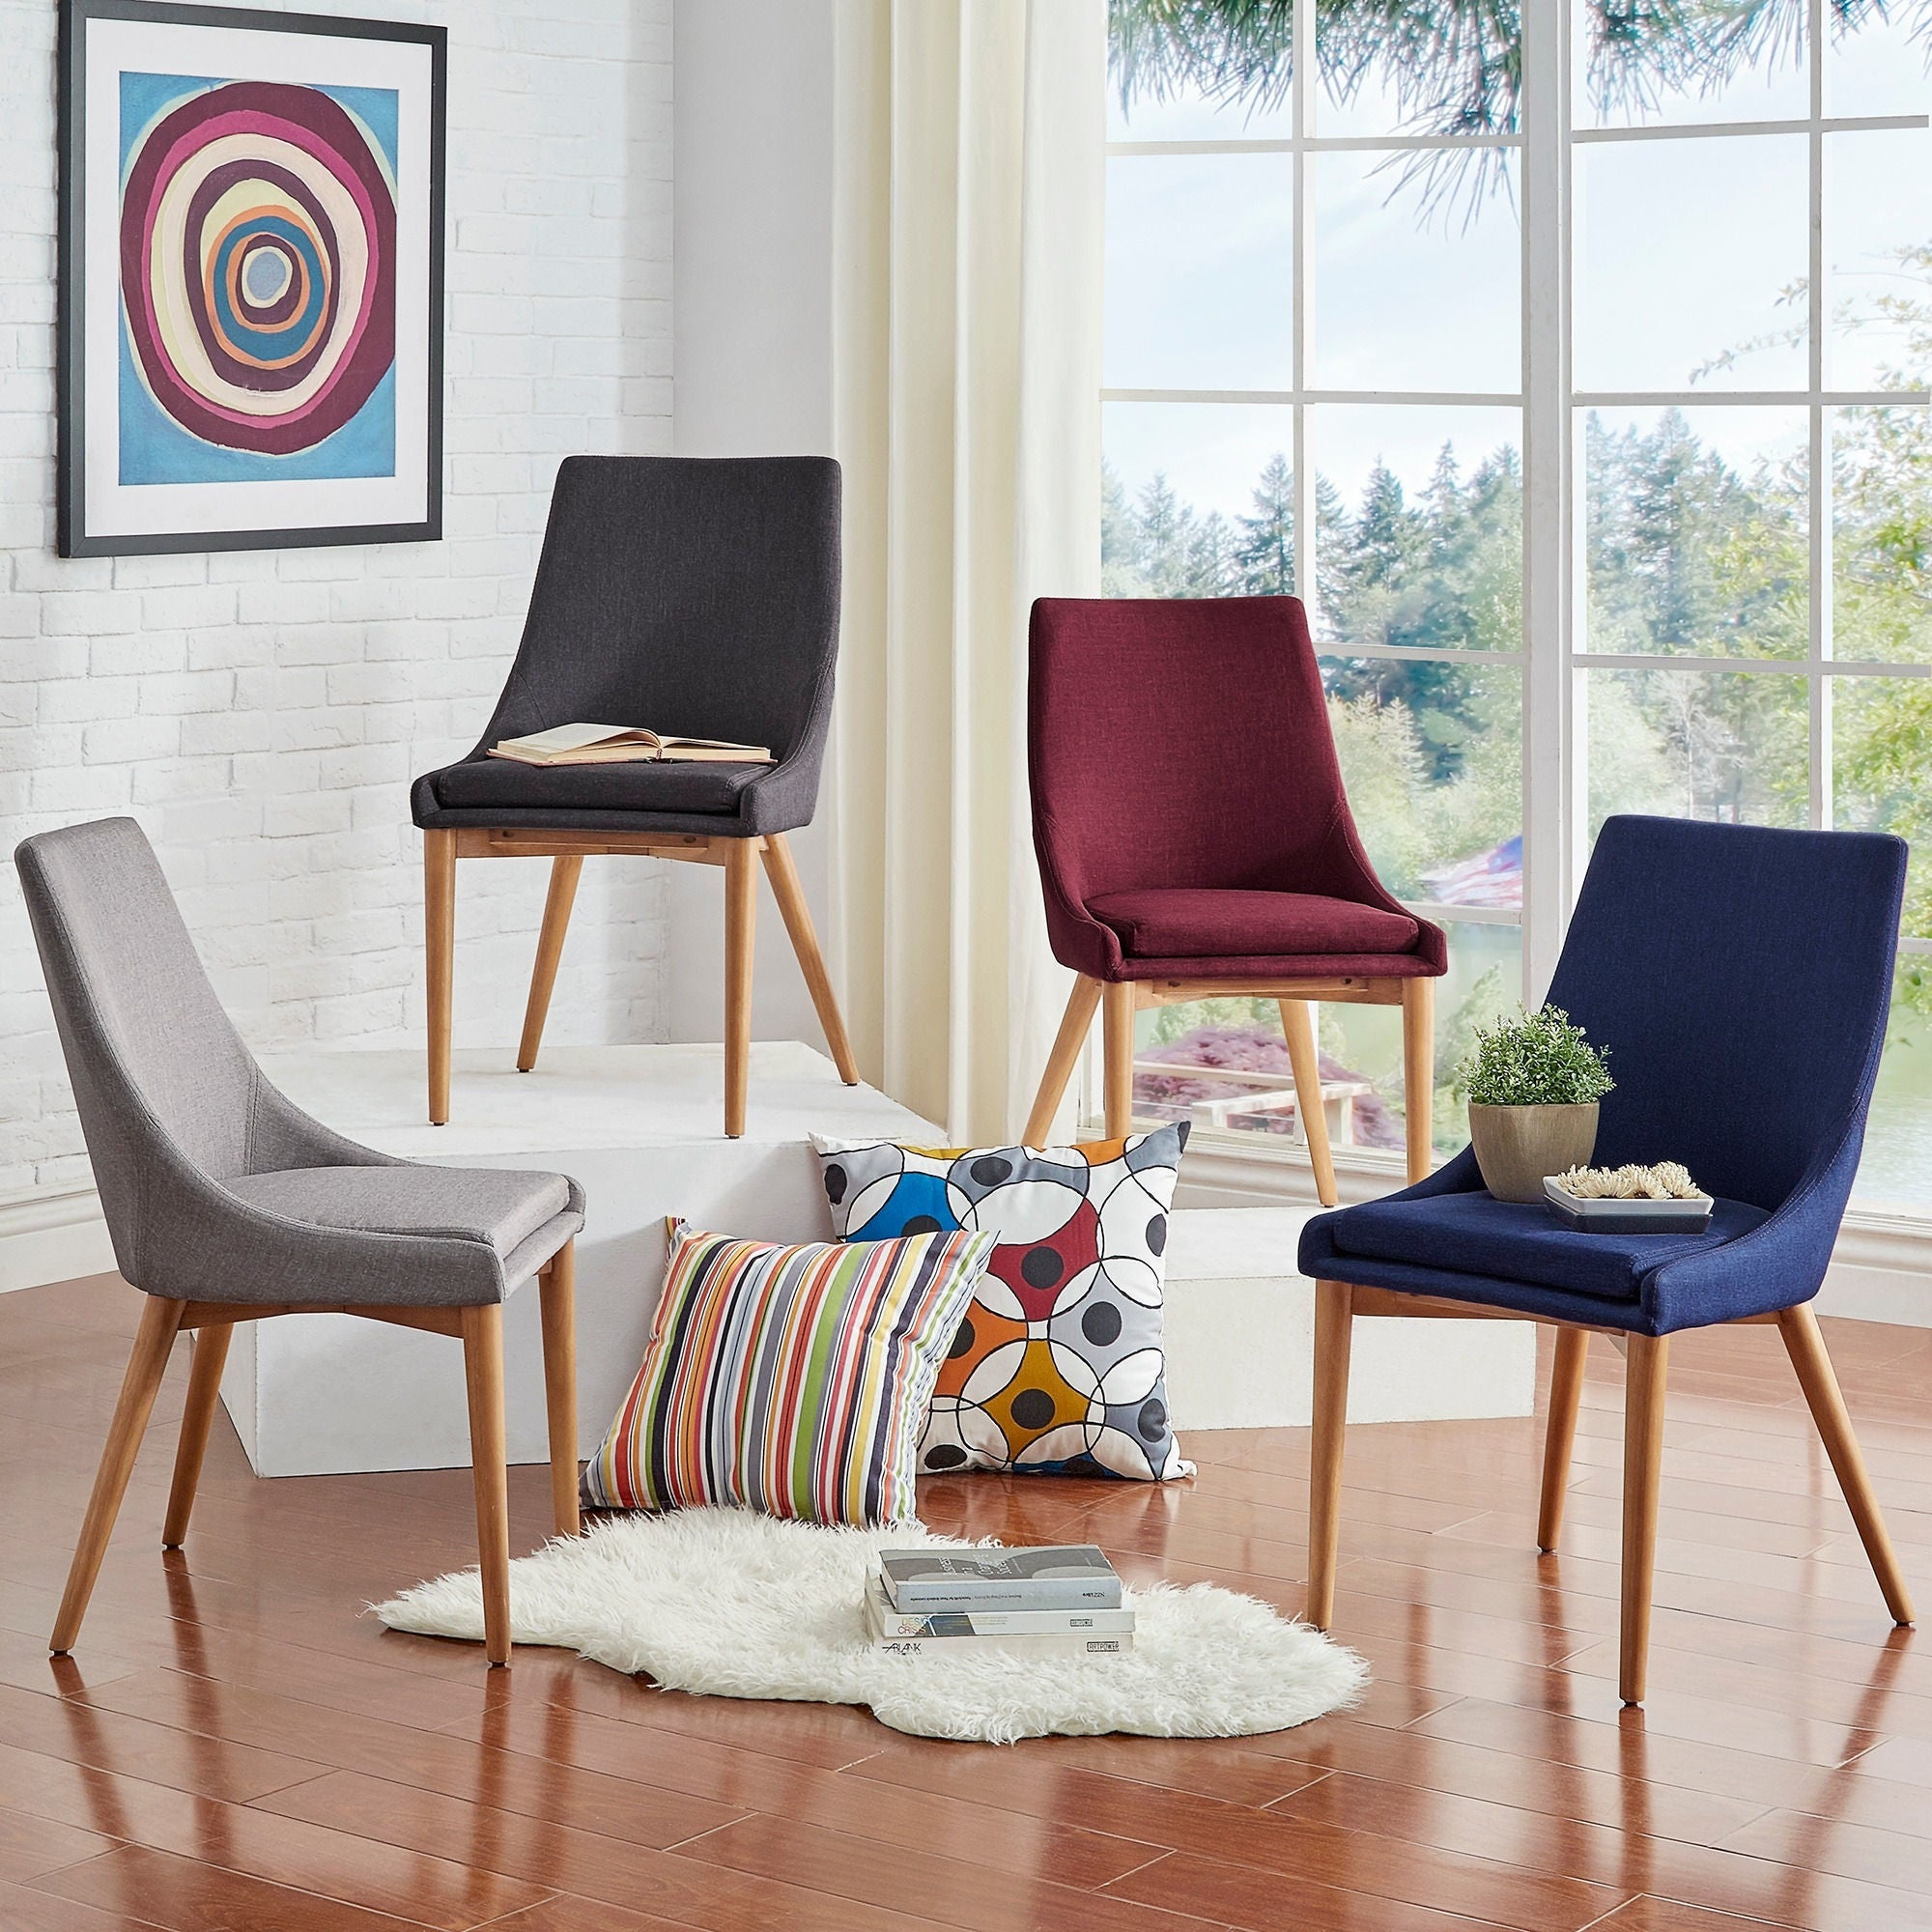 Sasha Oak Barrel Back Dining Chair (Set of 2) iNSPIRE Q Modern - Free  Shipping Today - Overstock.com - 18737573